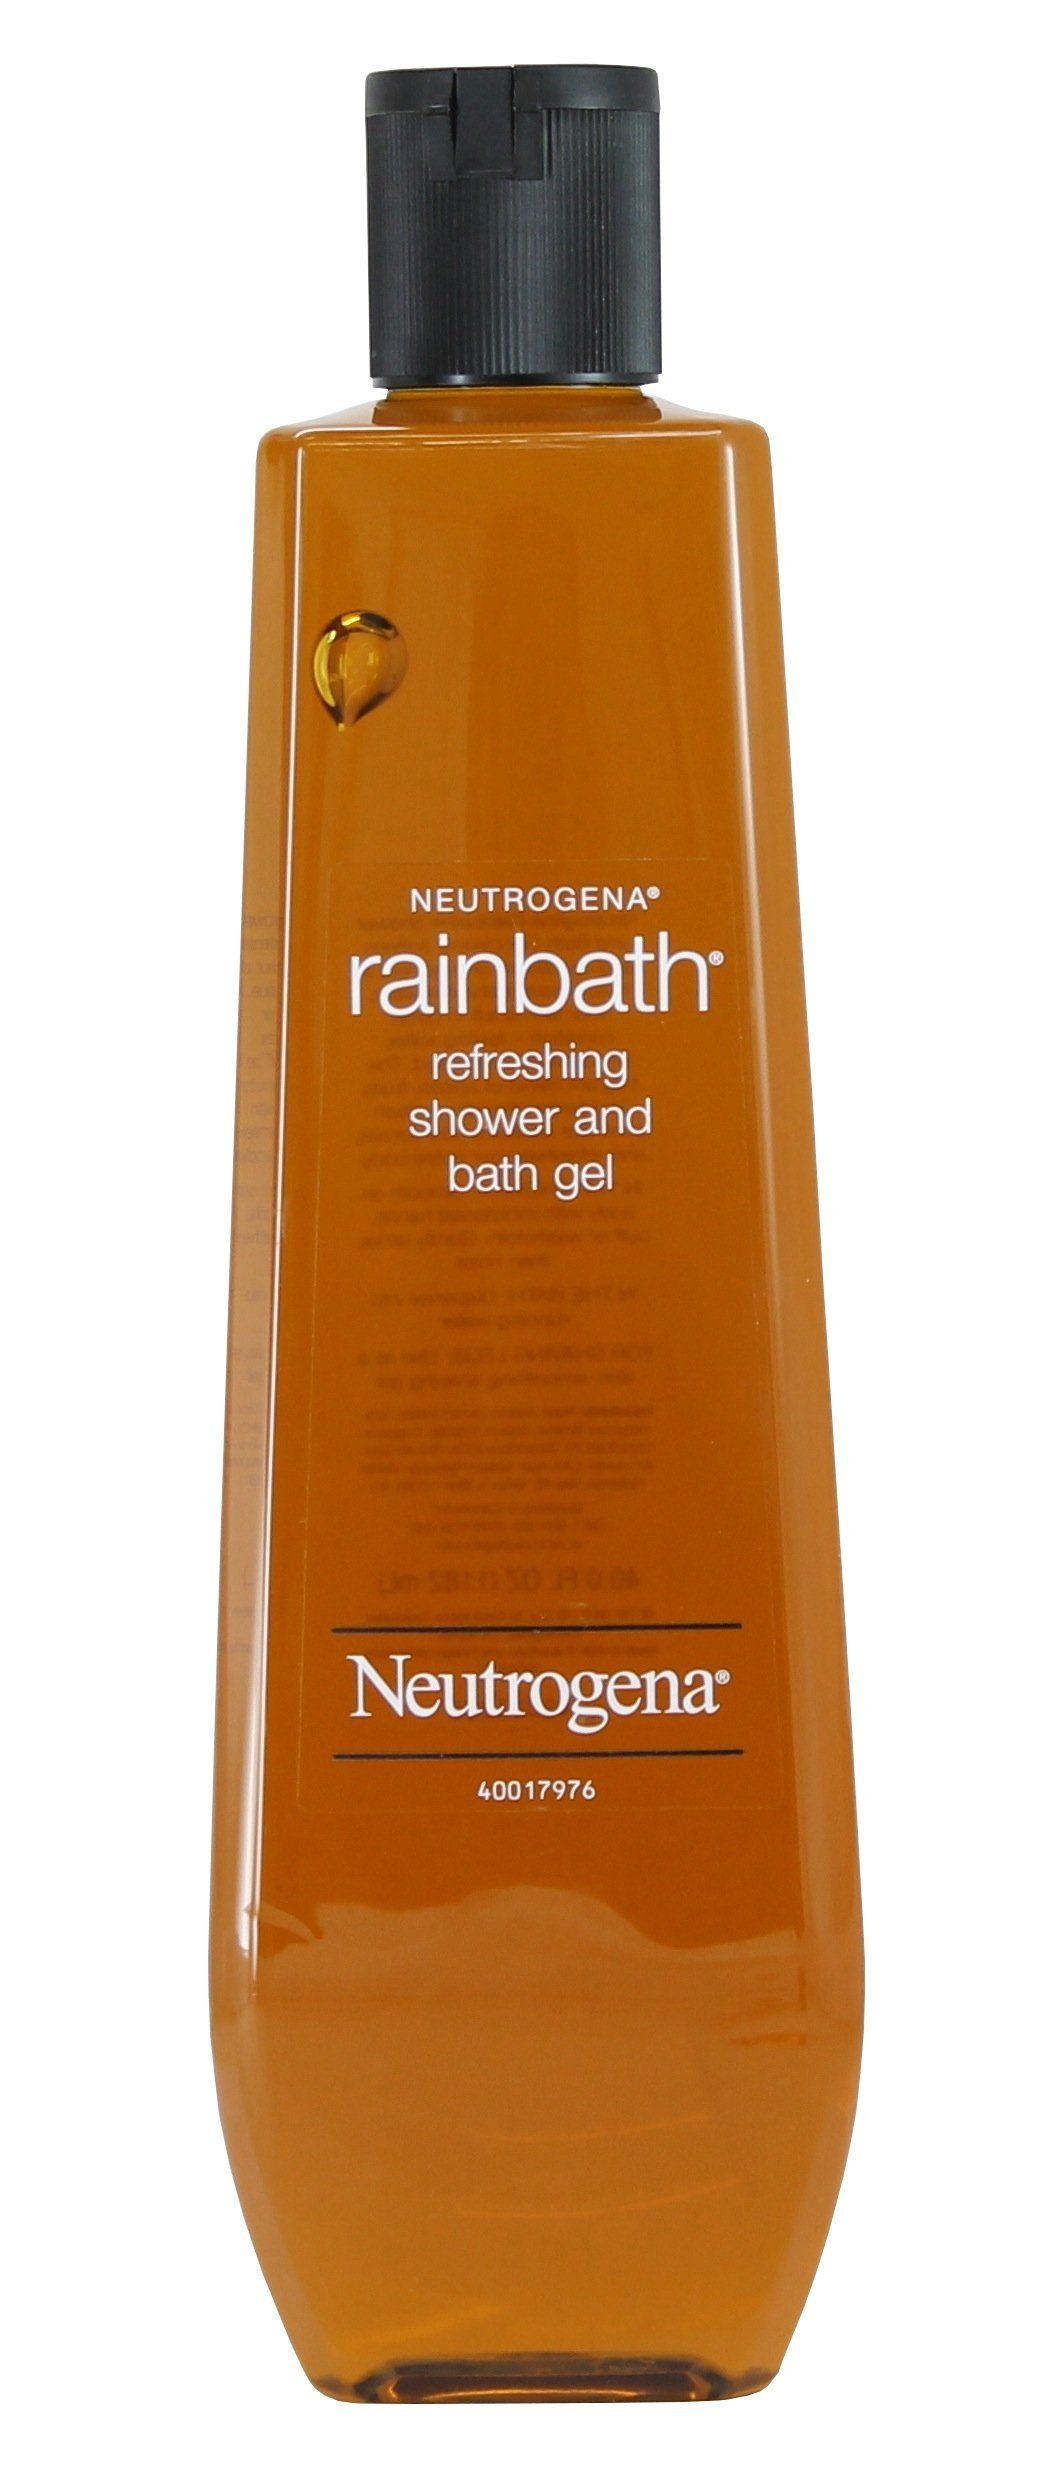 Neutrogena Rainbath Shower & Bath Gel- 40oz, 1count